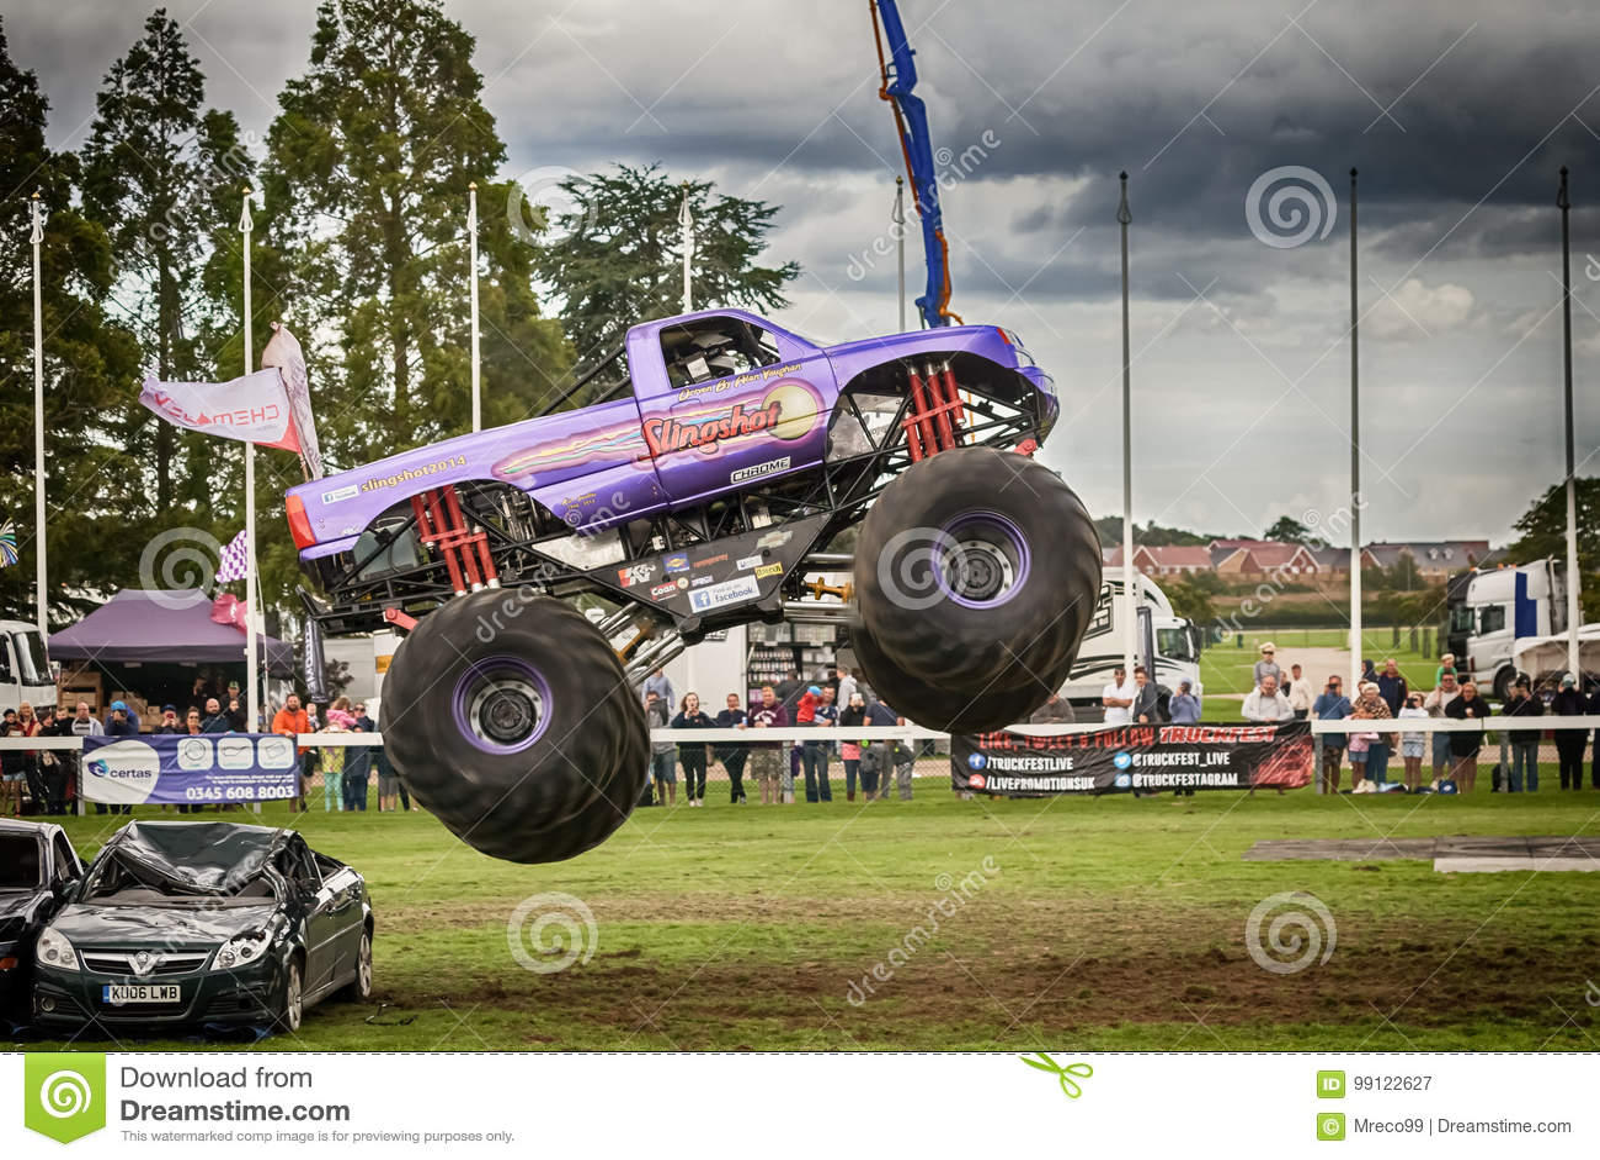 Salto del mediados de aire del monster truck